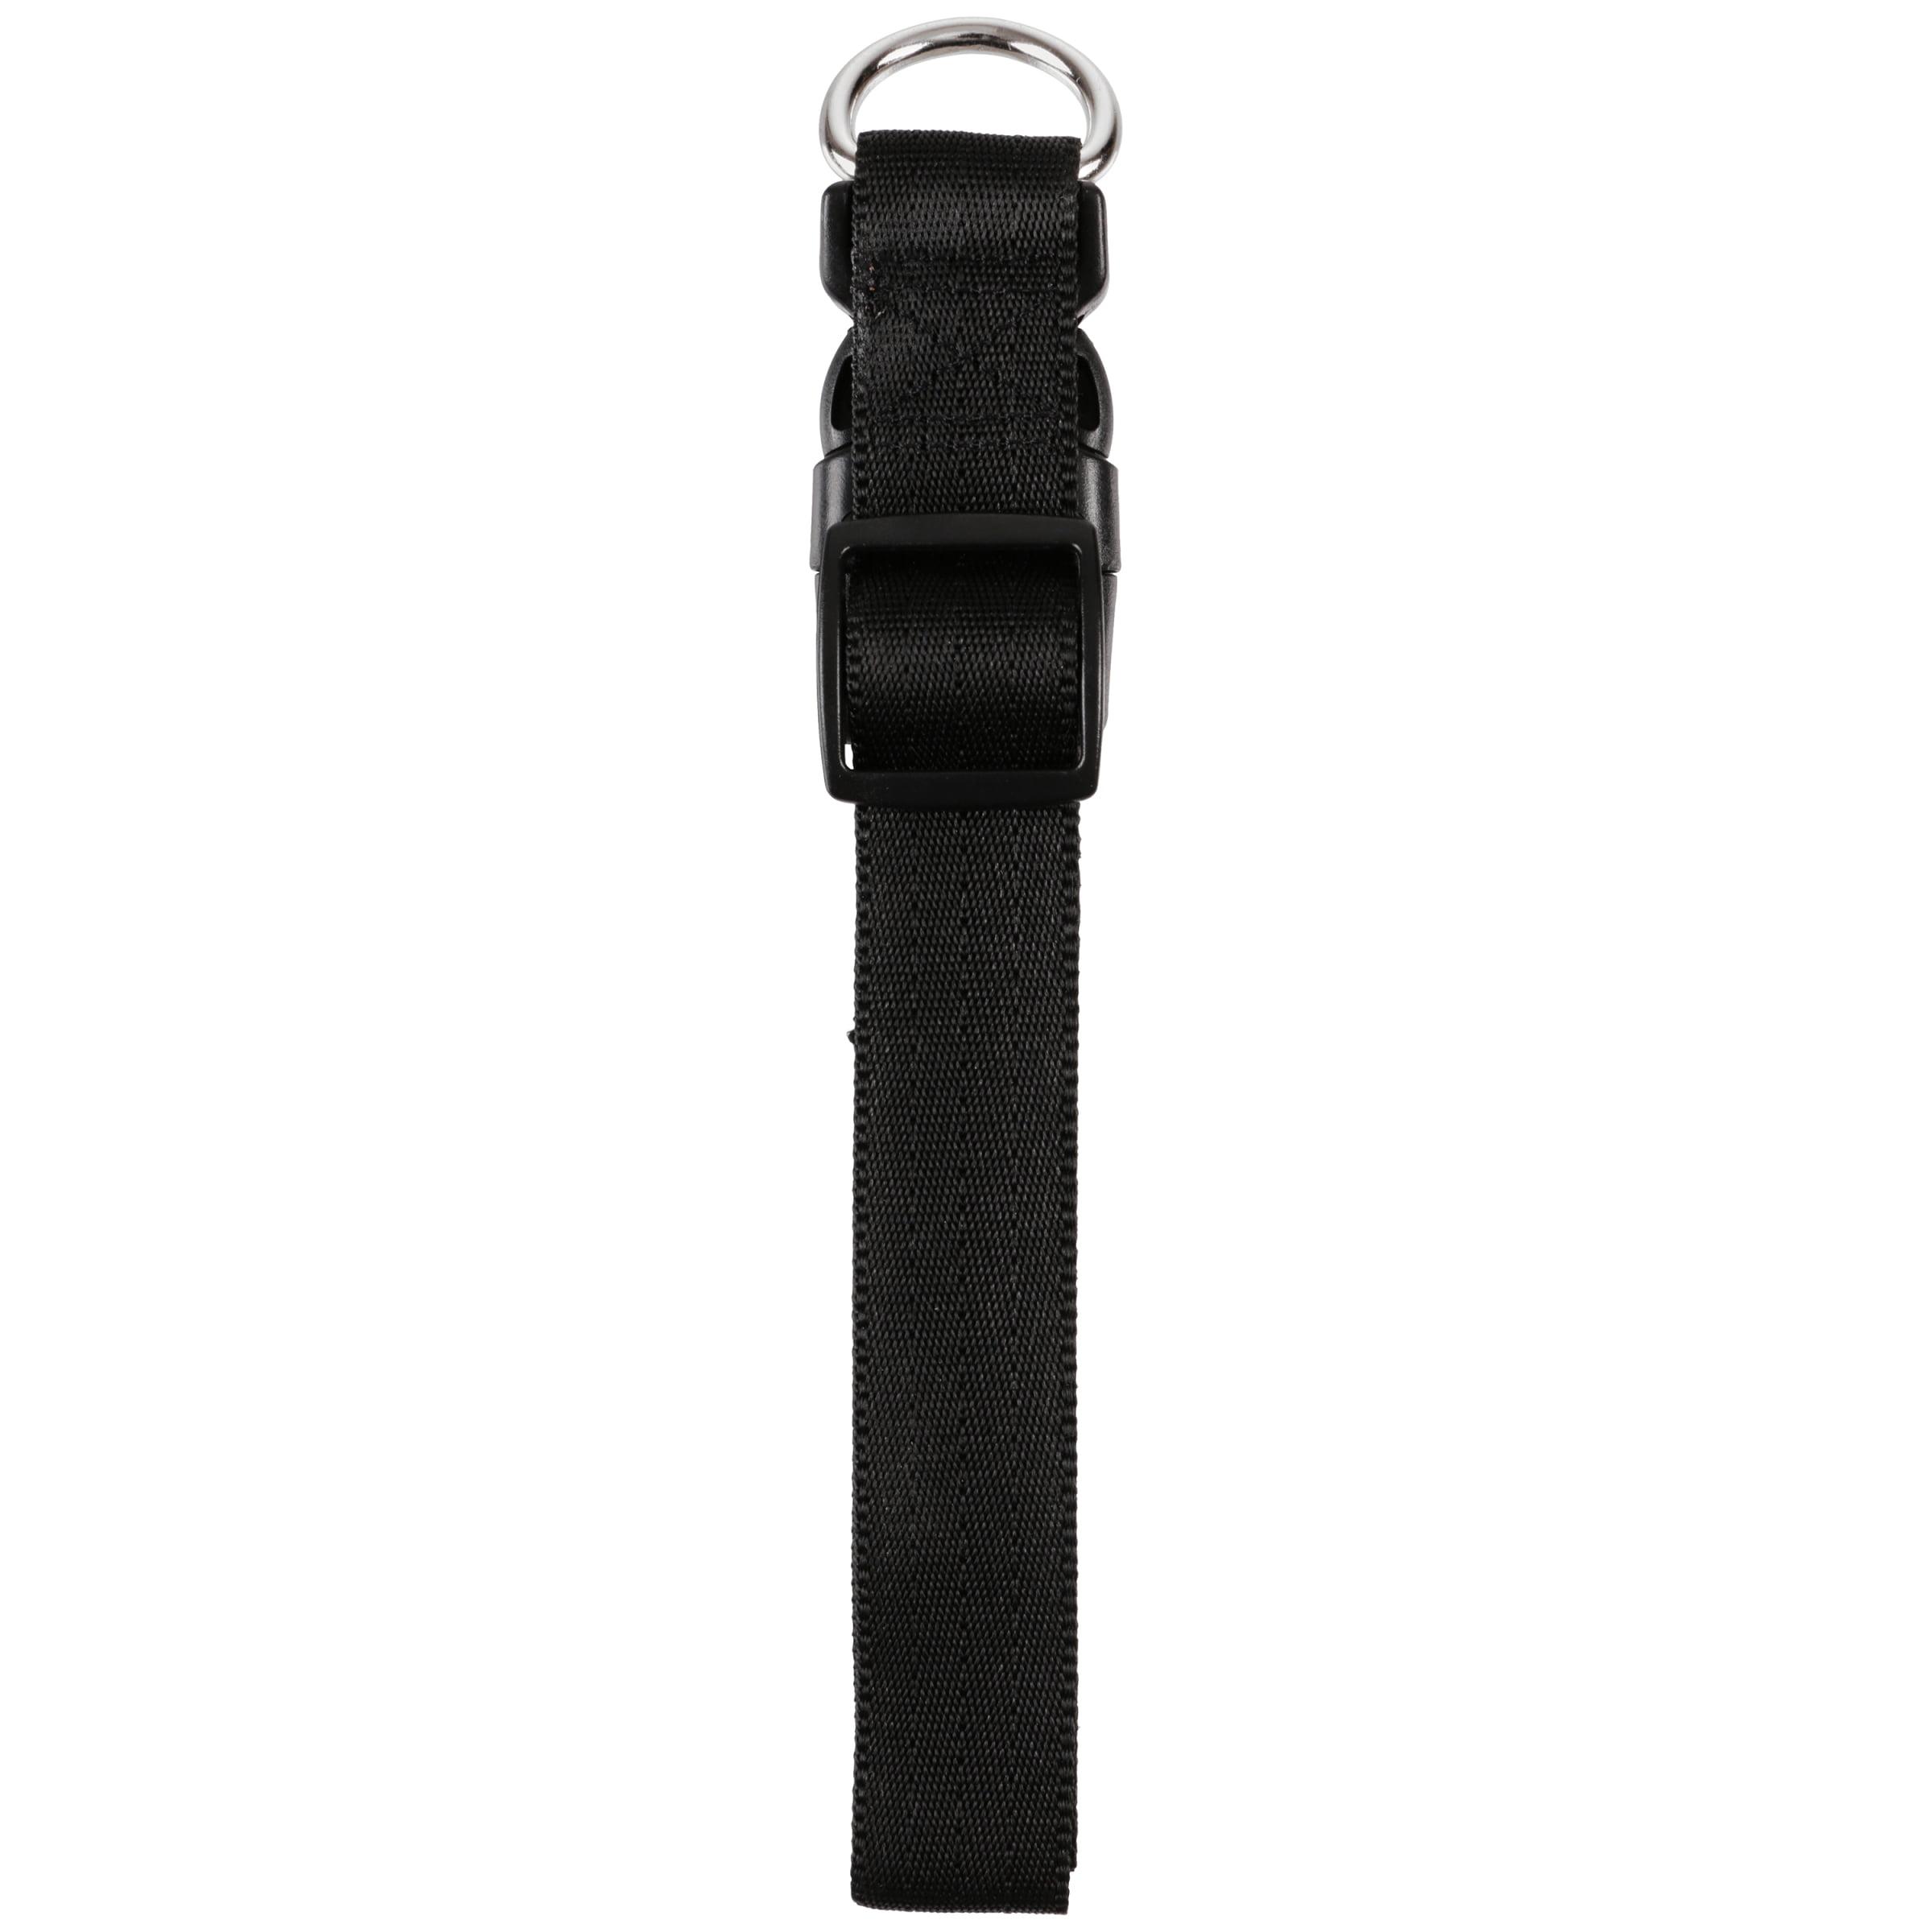 PetWear Adjustable Dog Collar, Black by Pro Group Inc